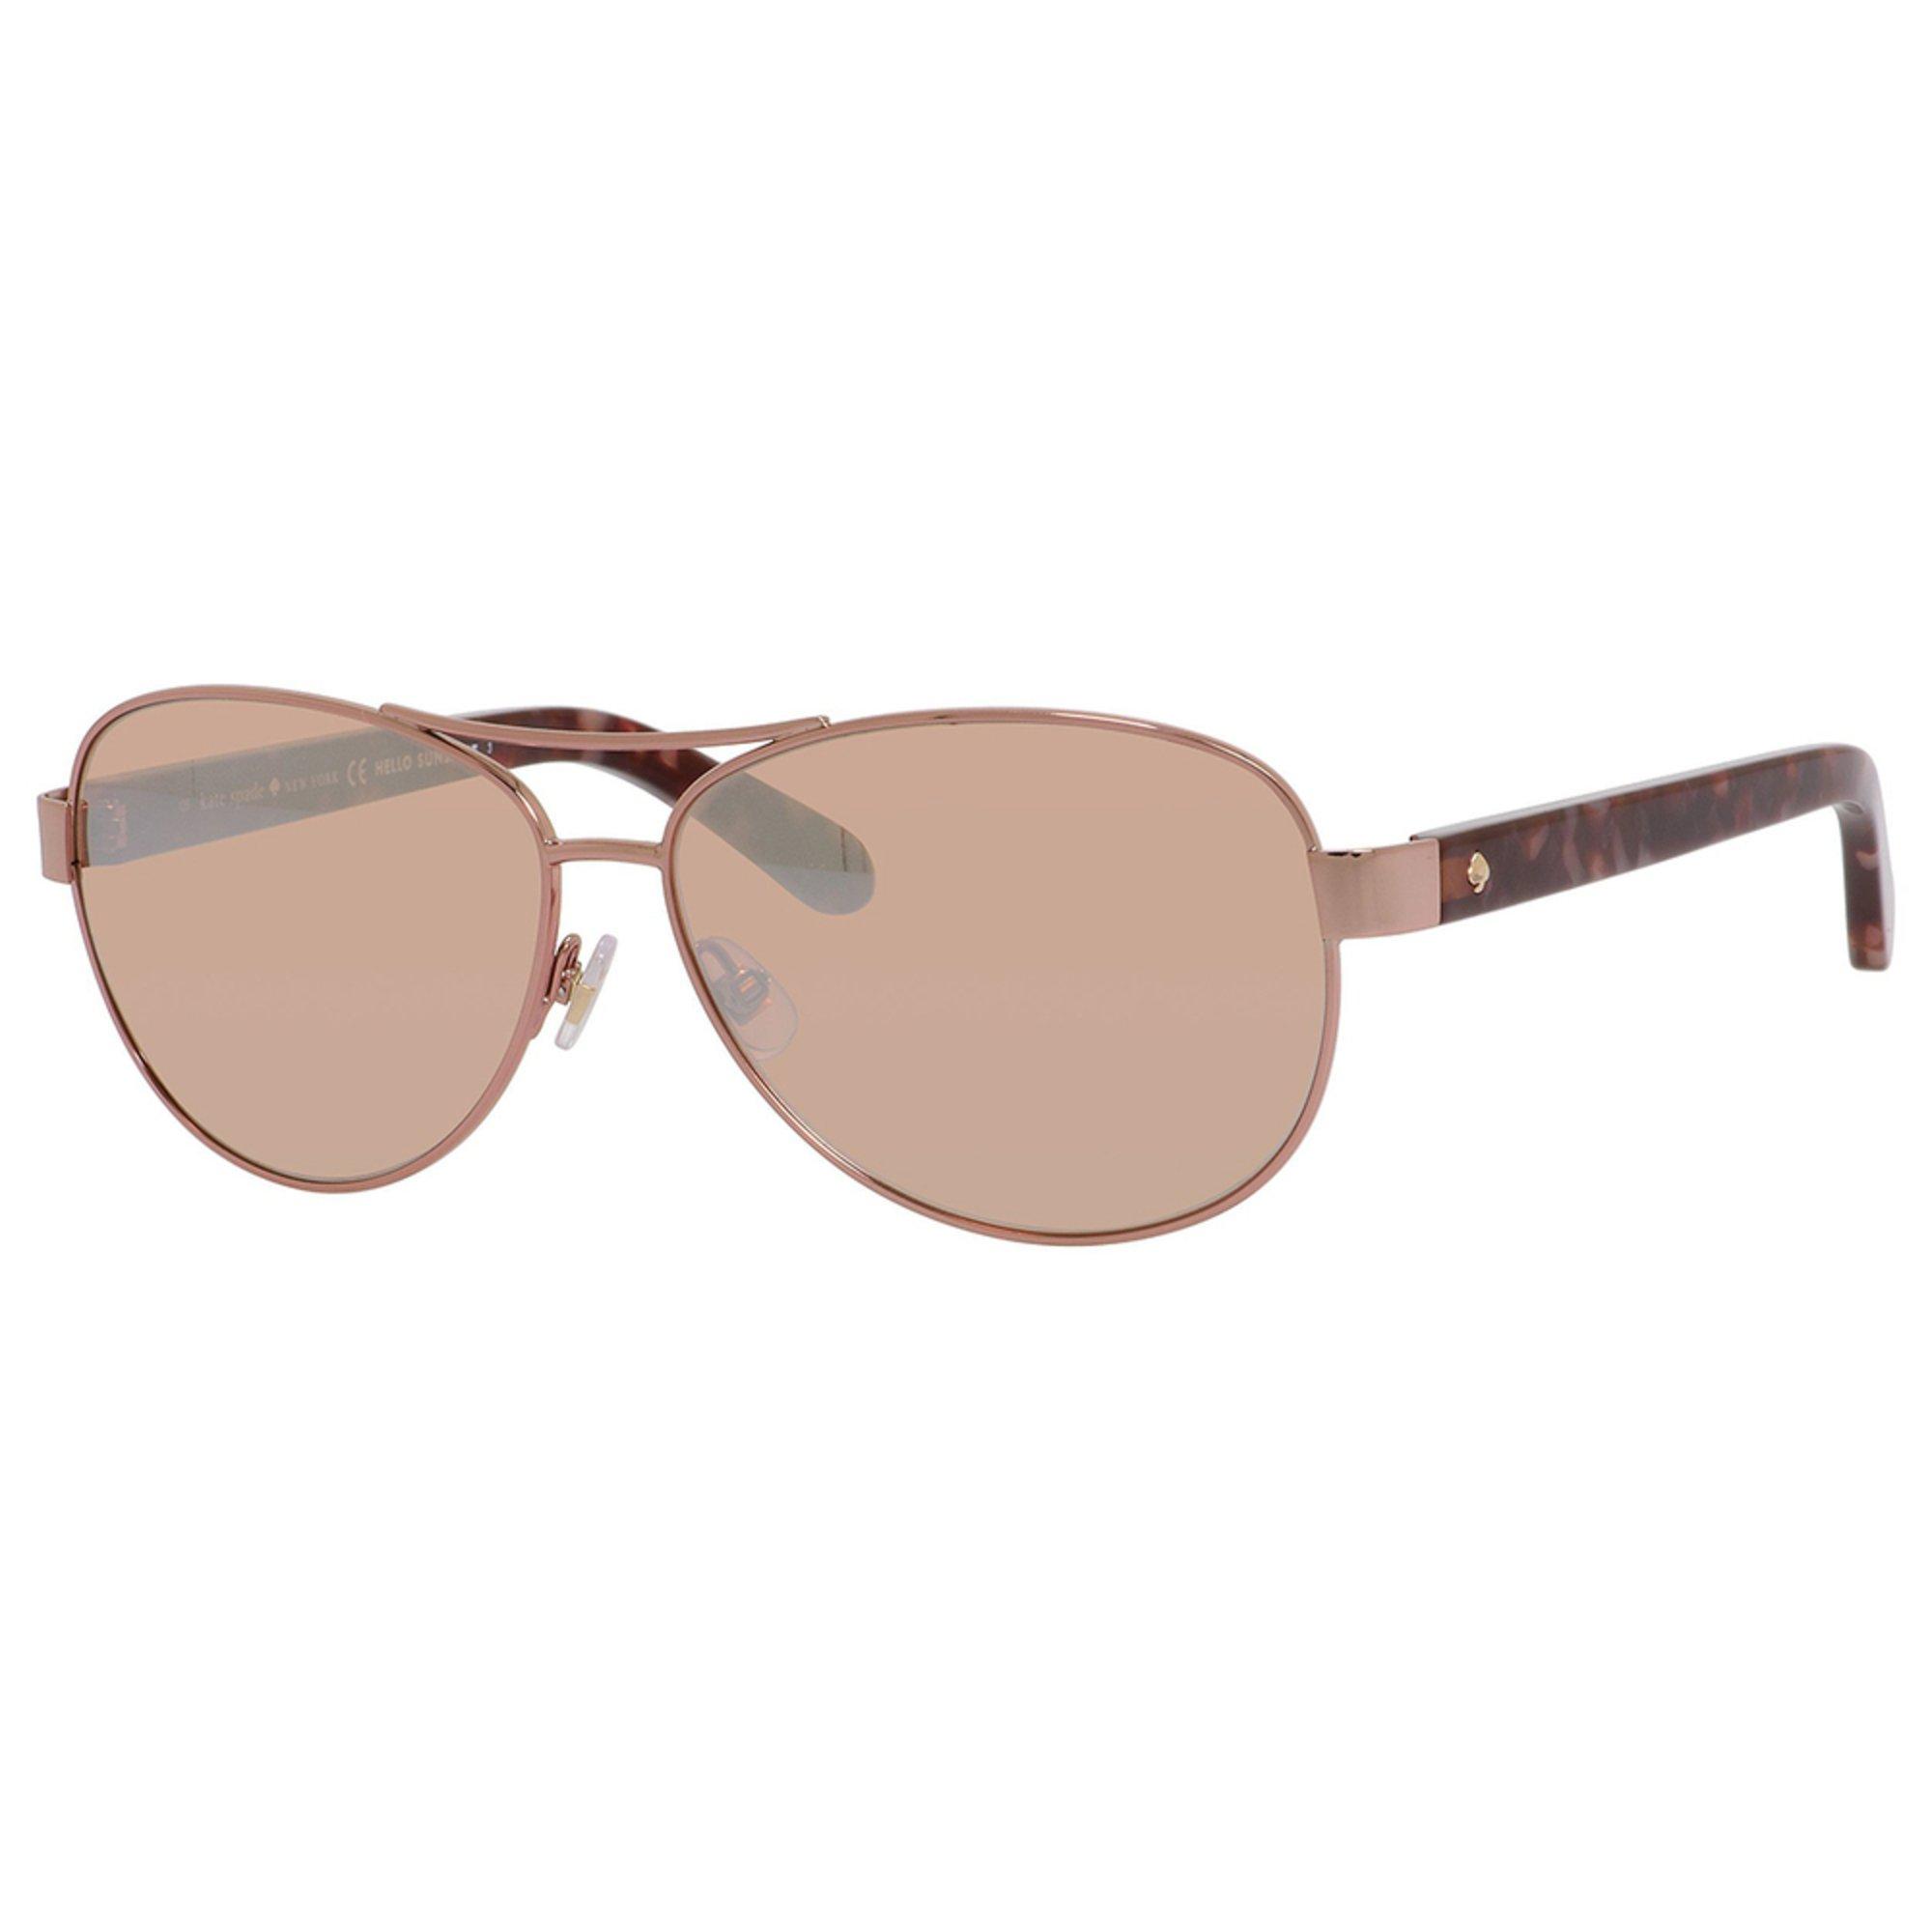 35411069a65 Kate Spade New York. Kate Spade New York Women s Dalia 2 Aviator Sunglasses  58mm